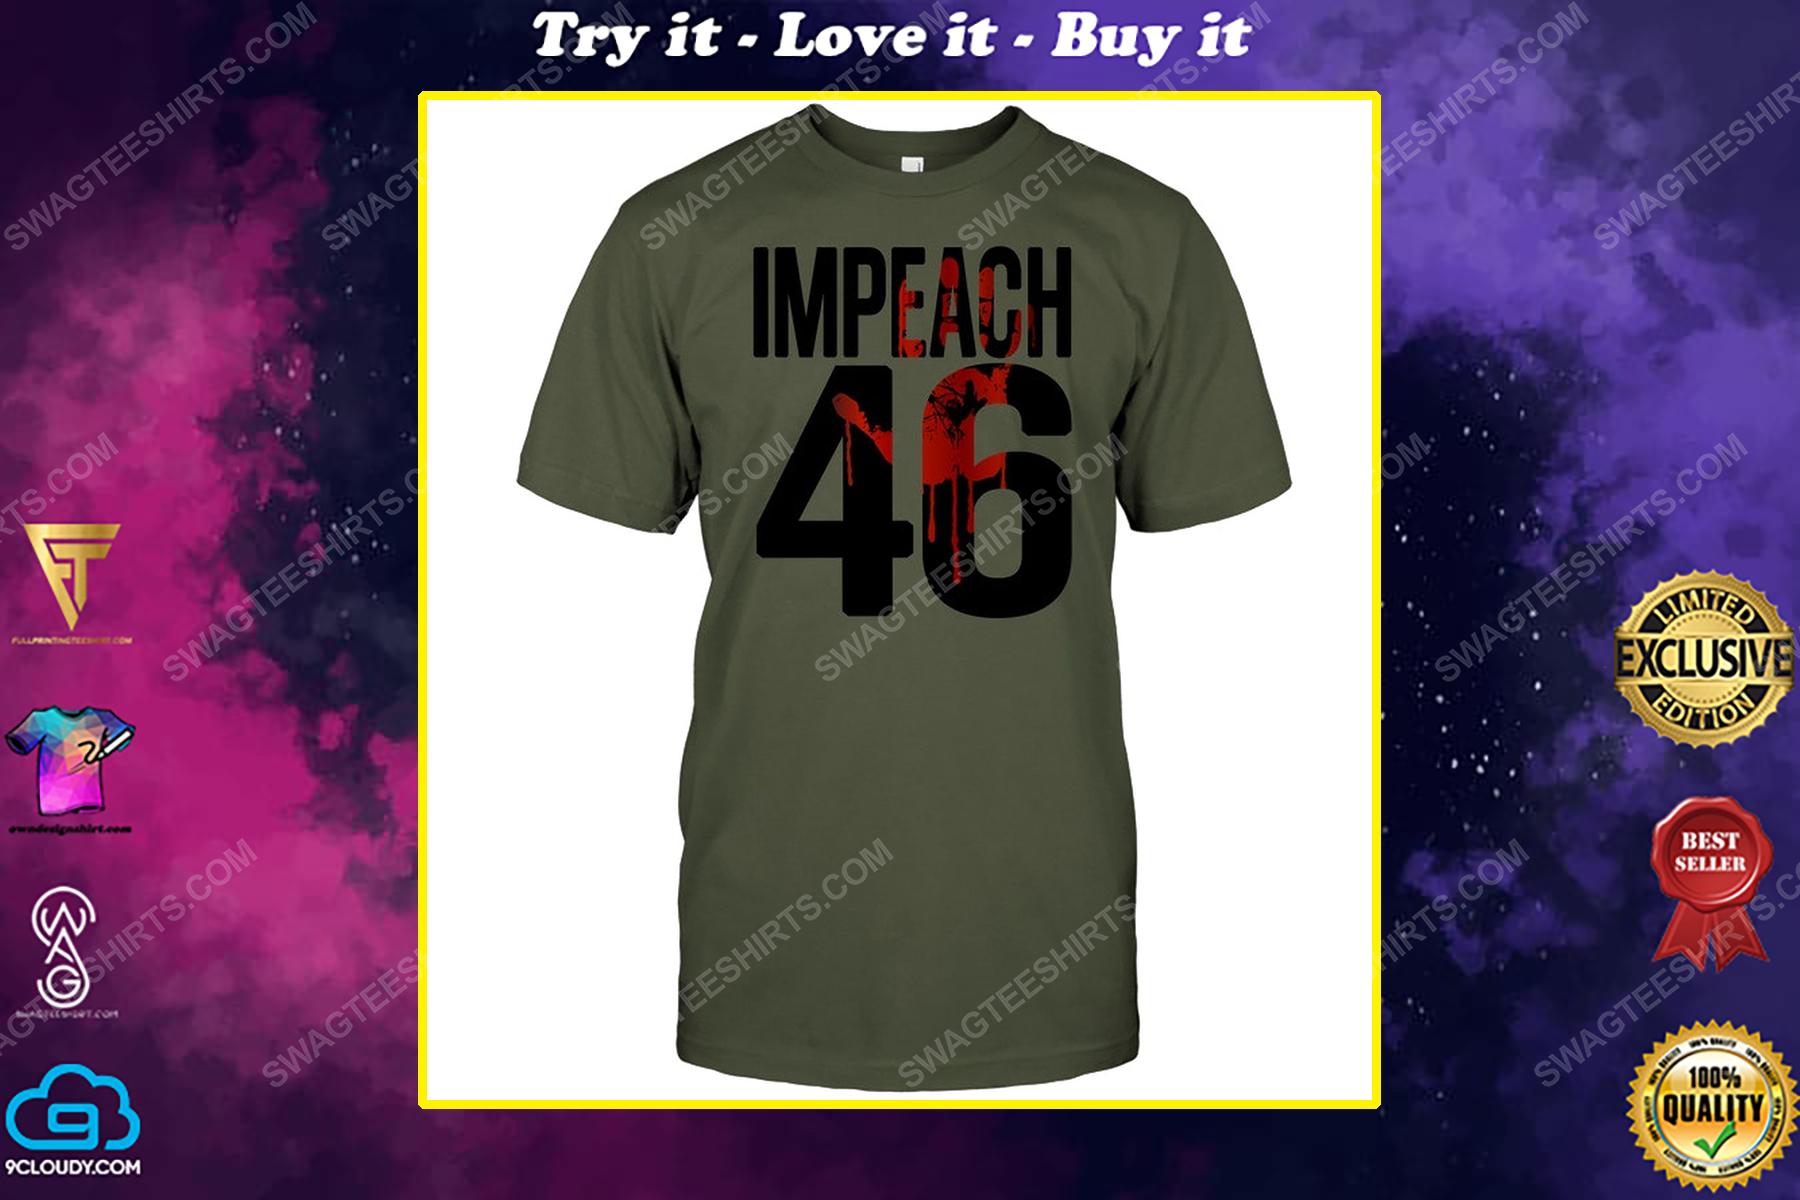 Impeach 46 blood halloween political shirt